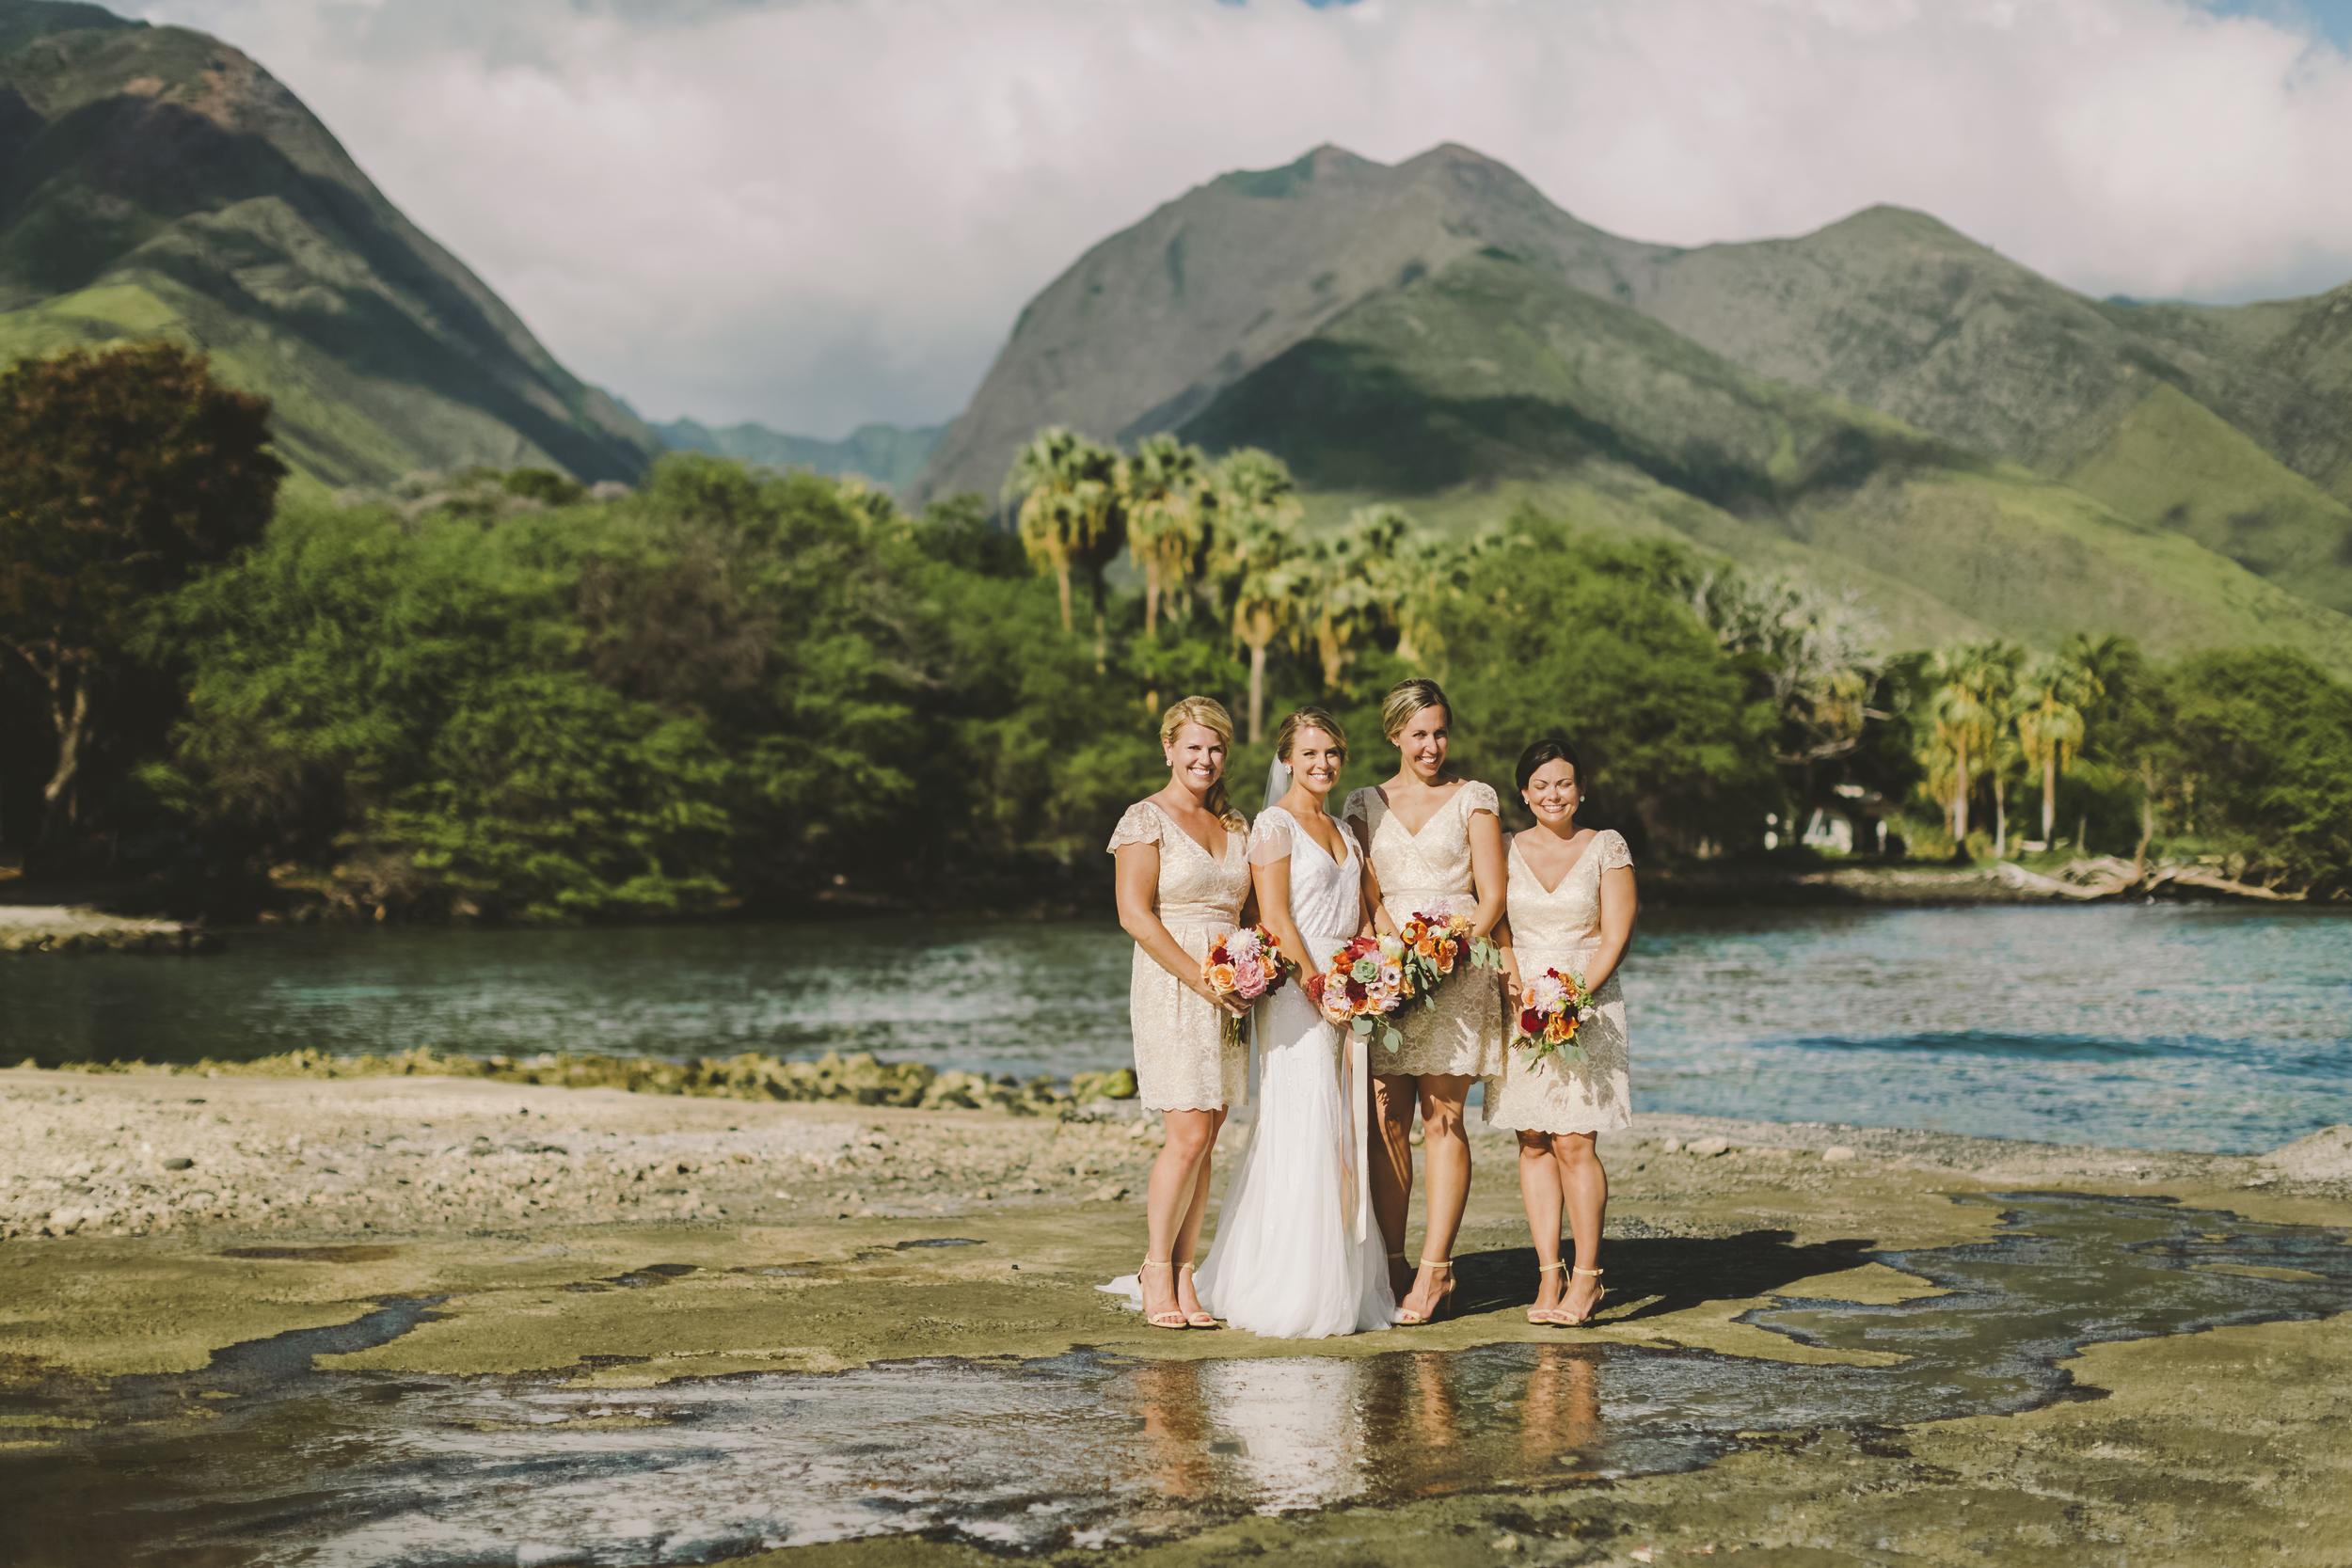 angie-diaz-photography-maui-wedding-mel-matt-62.jpeg